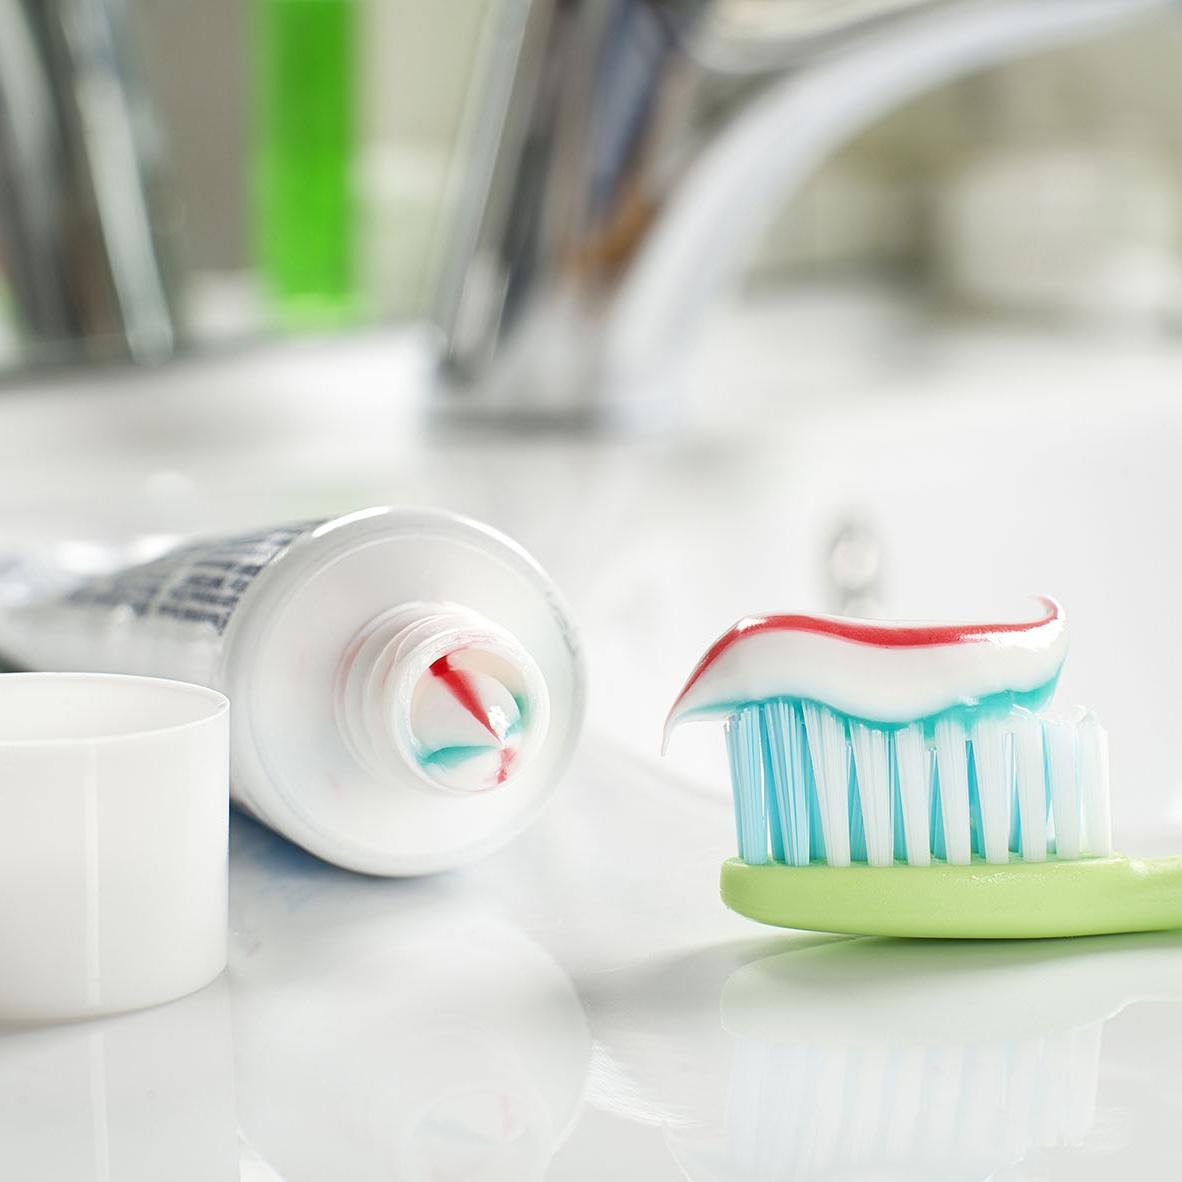 Synergy-toothbrush-biddulph.jpg